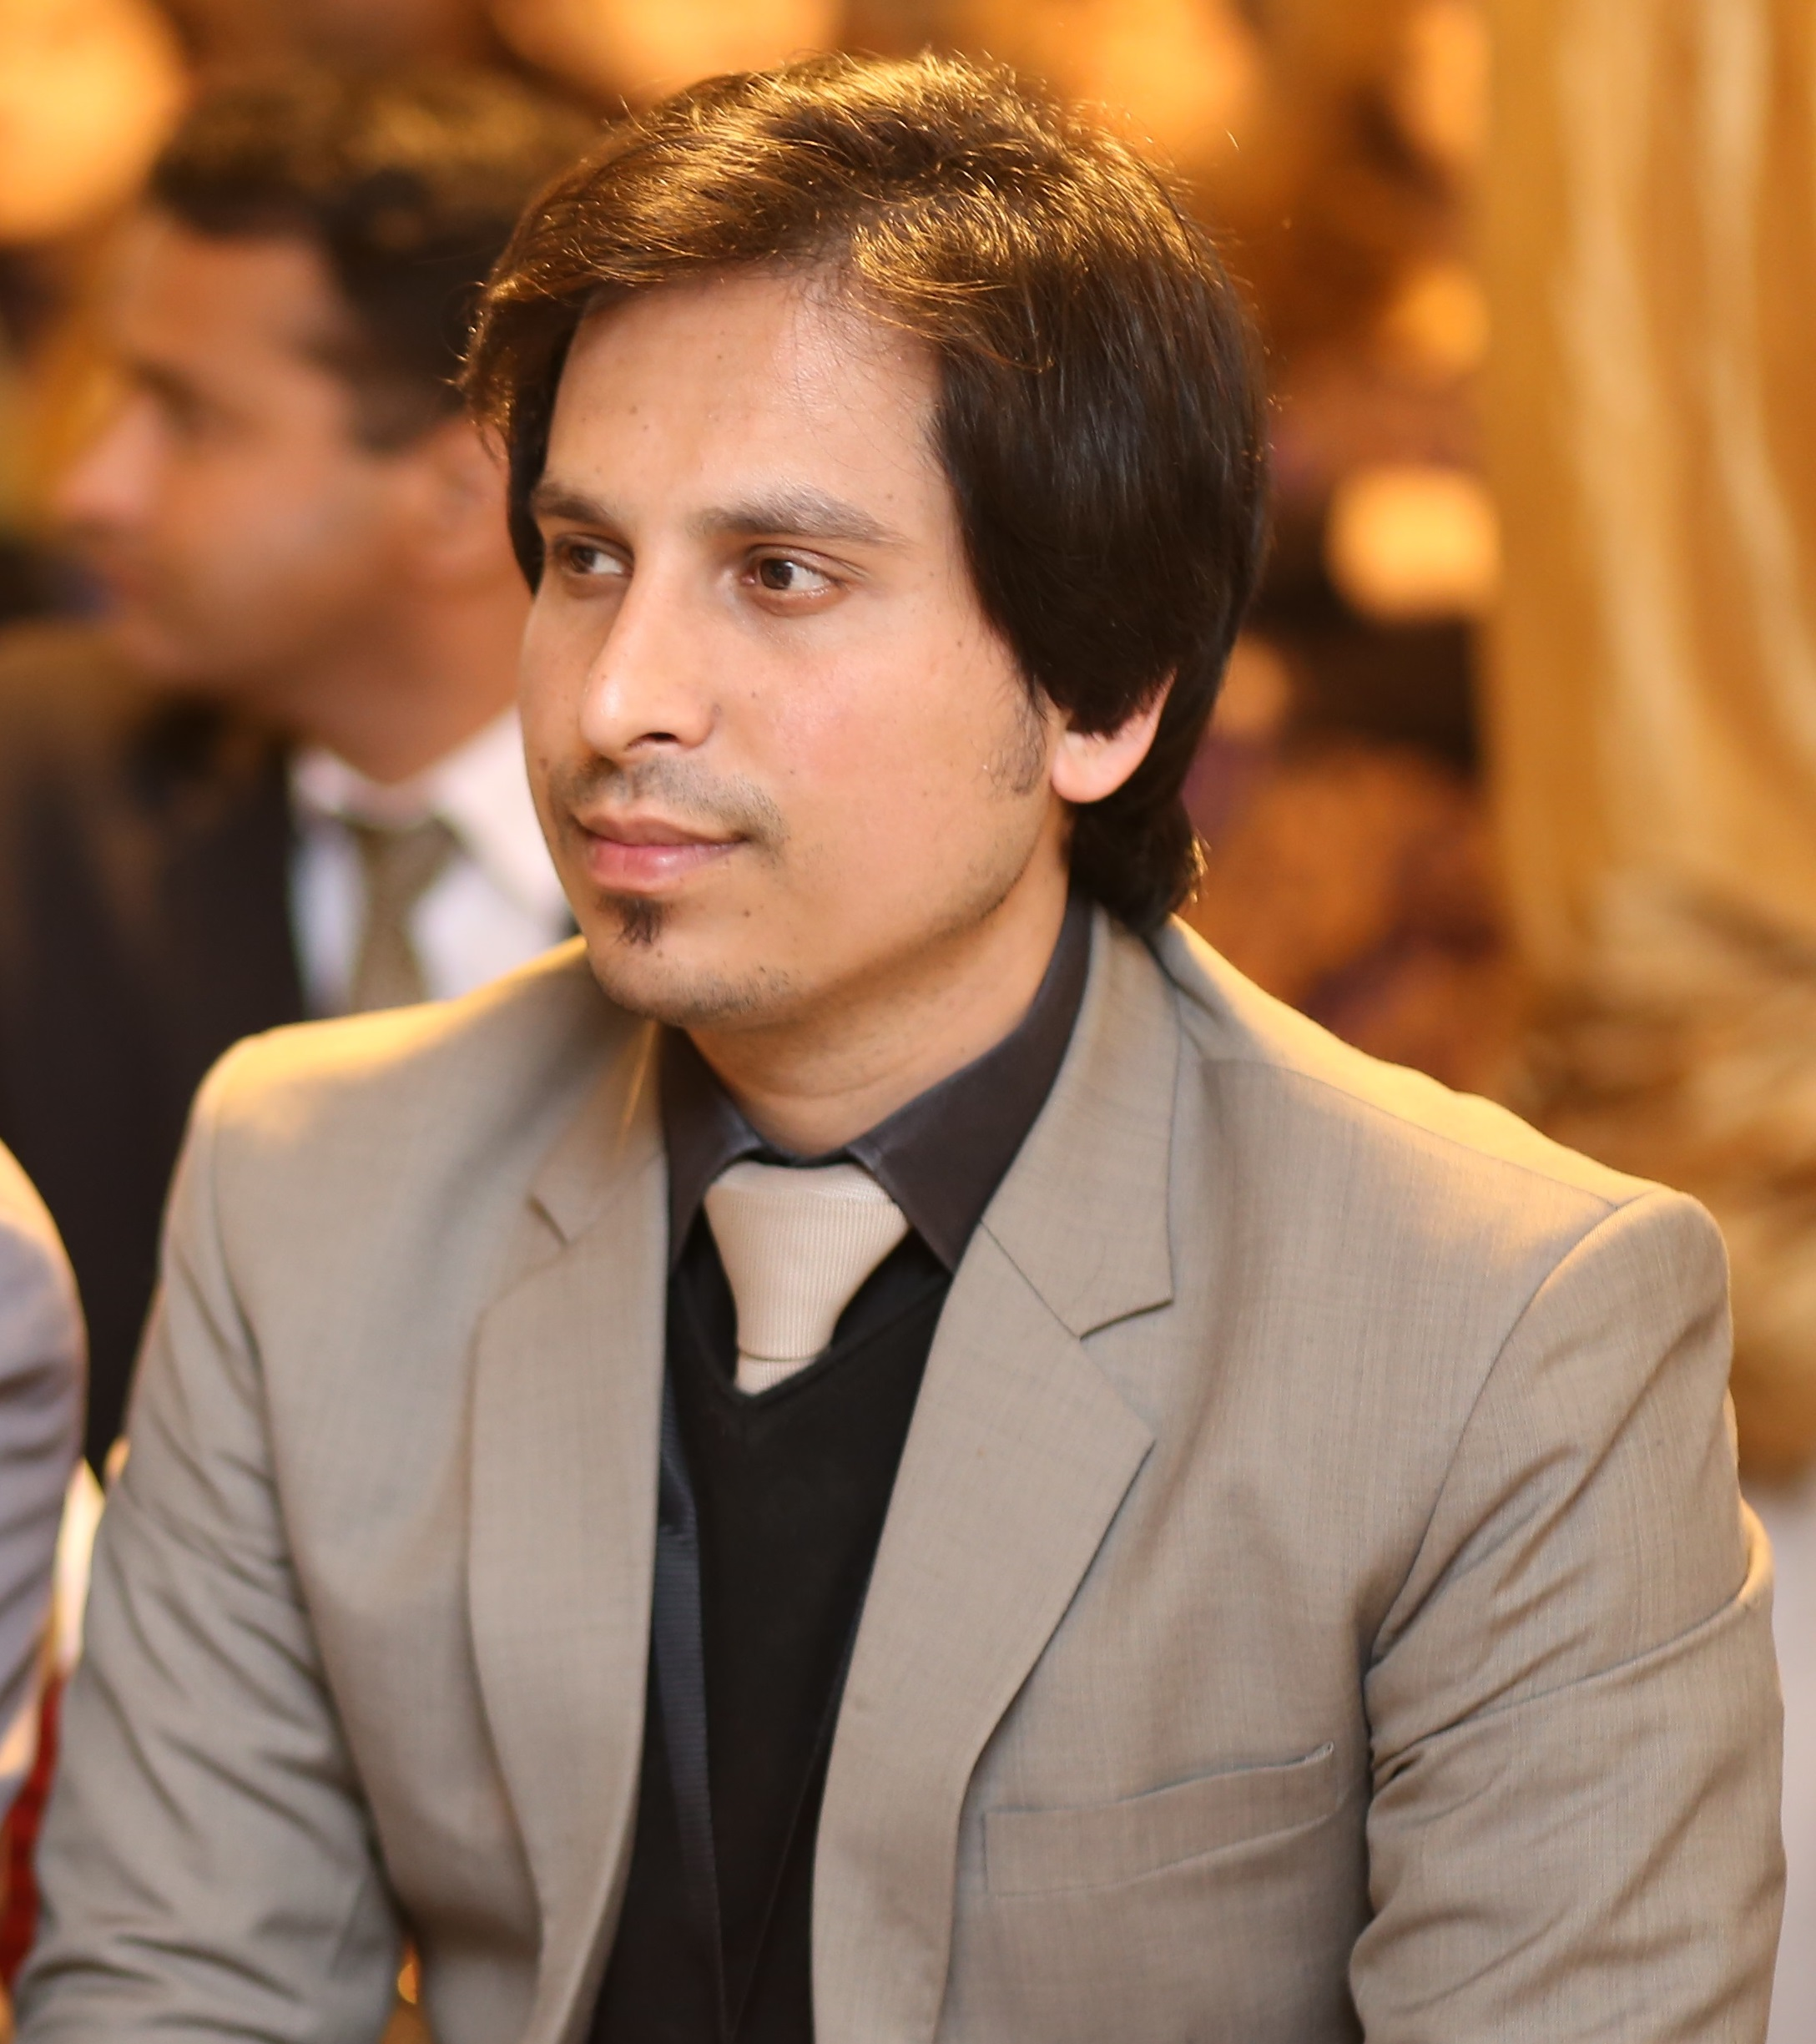 Mr. Muhammad Imran Malik